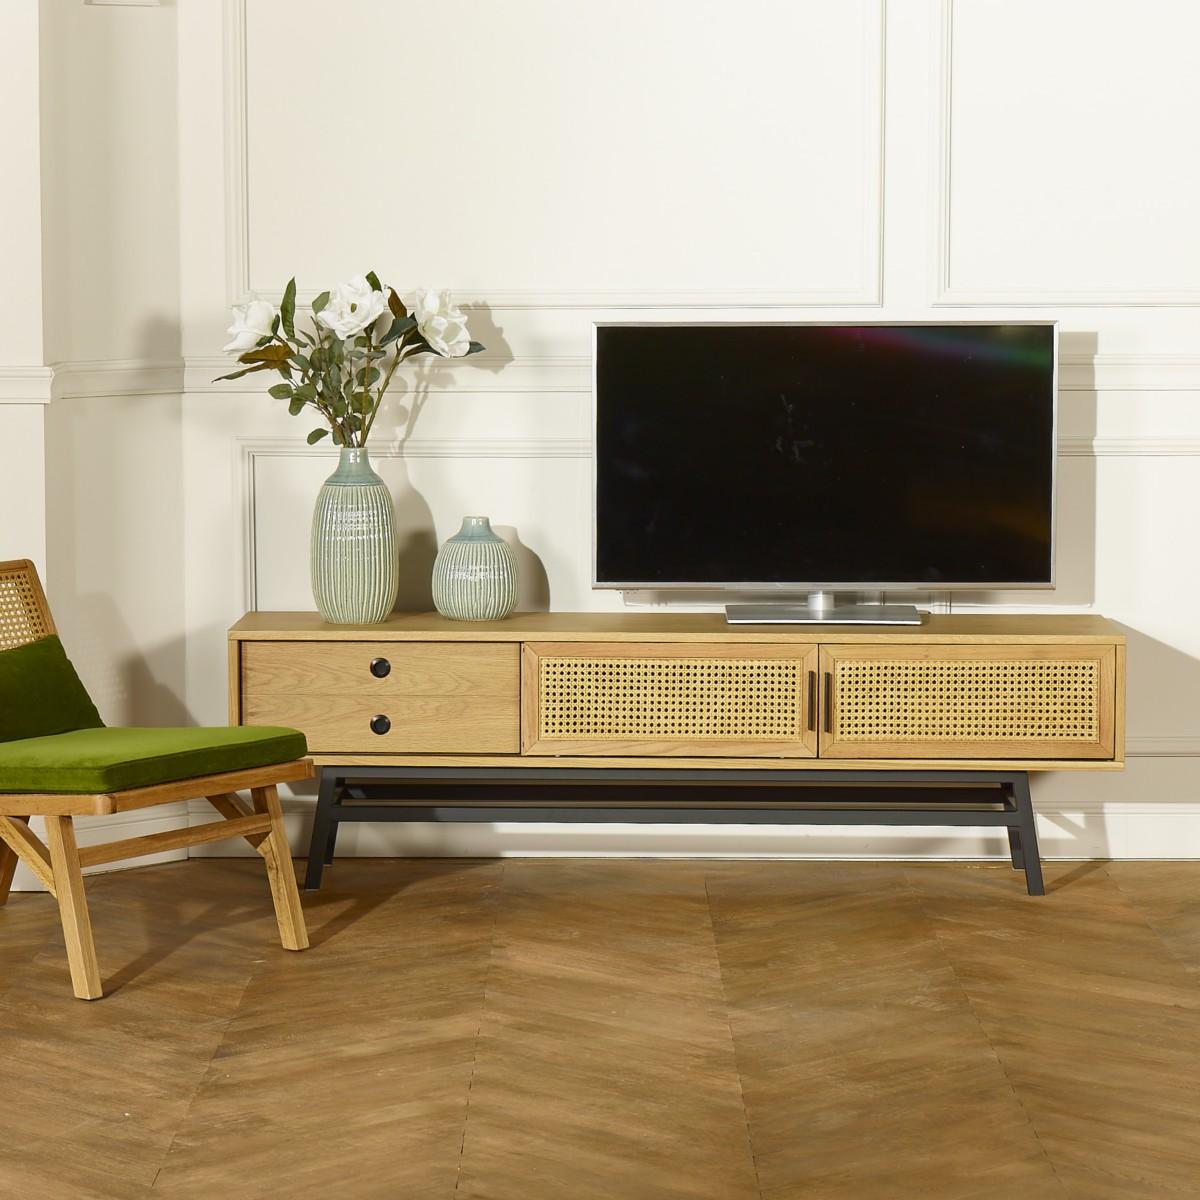 Grand meubles lalala robin des bois Meuble robin des bois